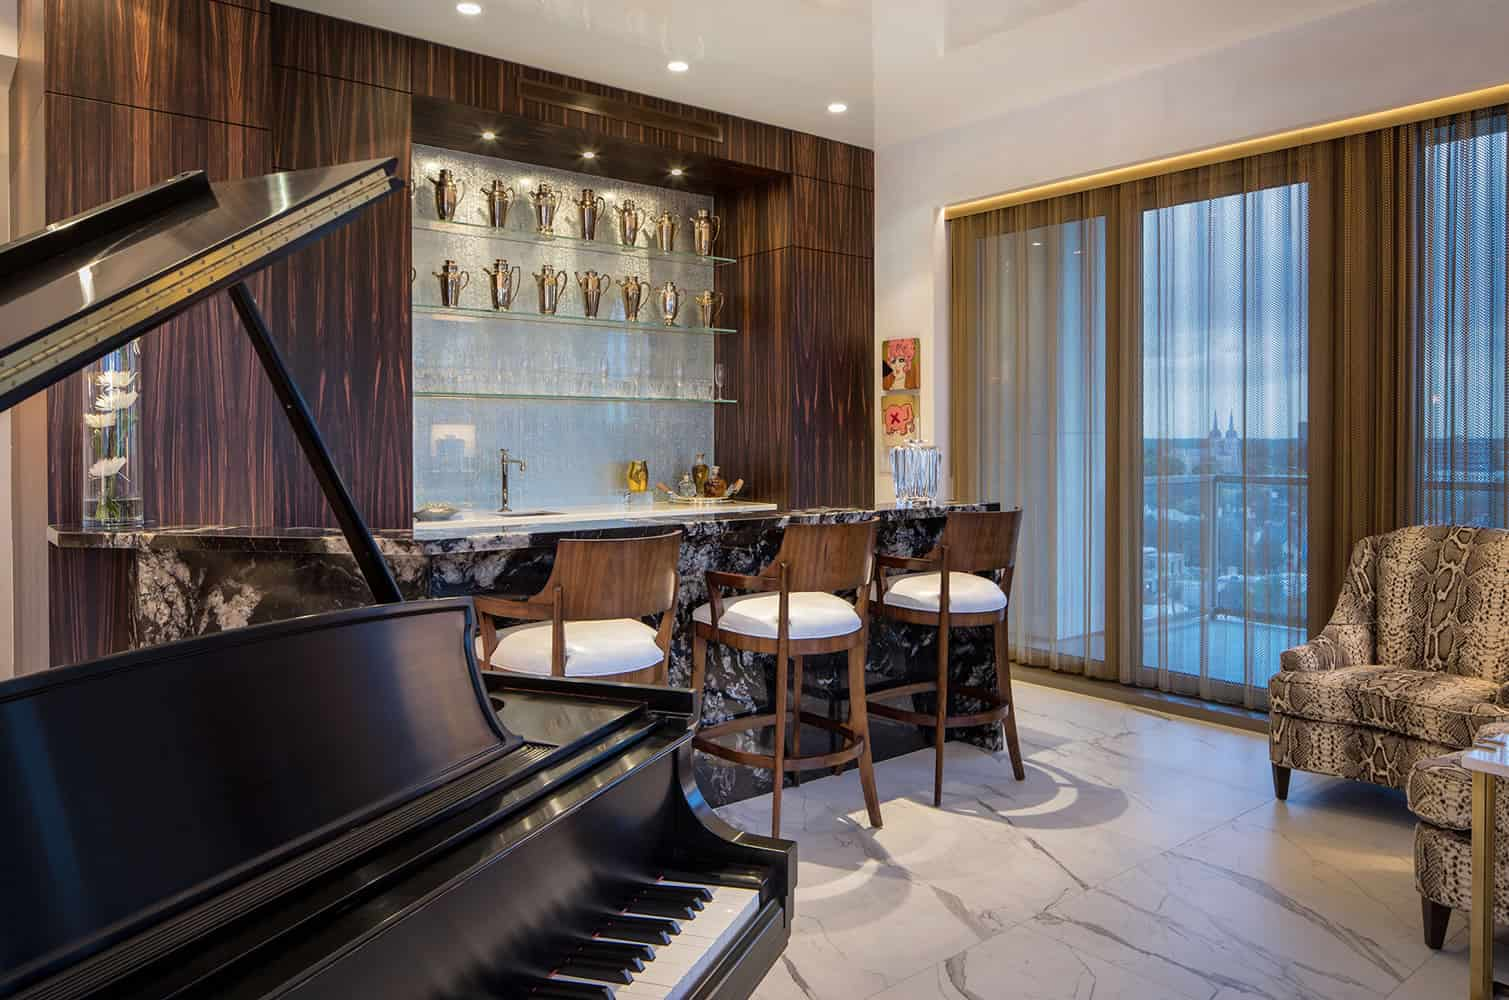 custom bar with bespoke barstools for enjoying entertainment beside the grand piano